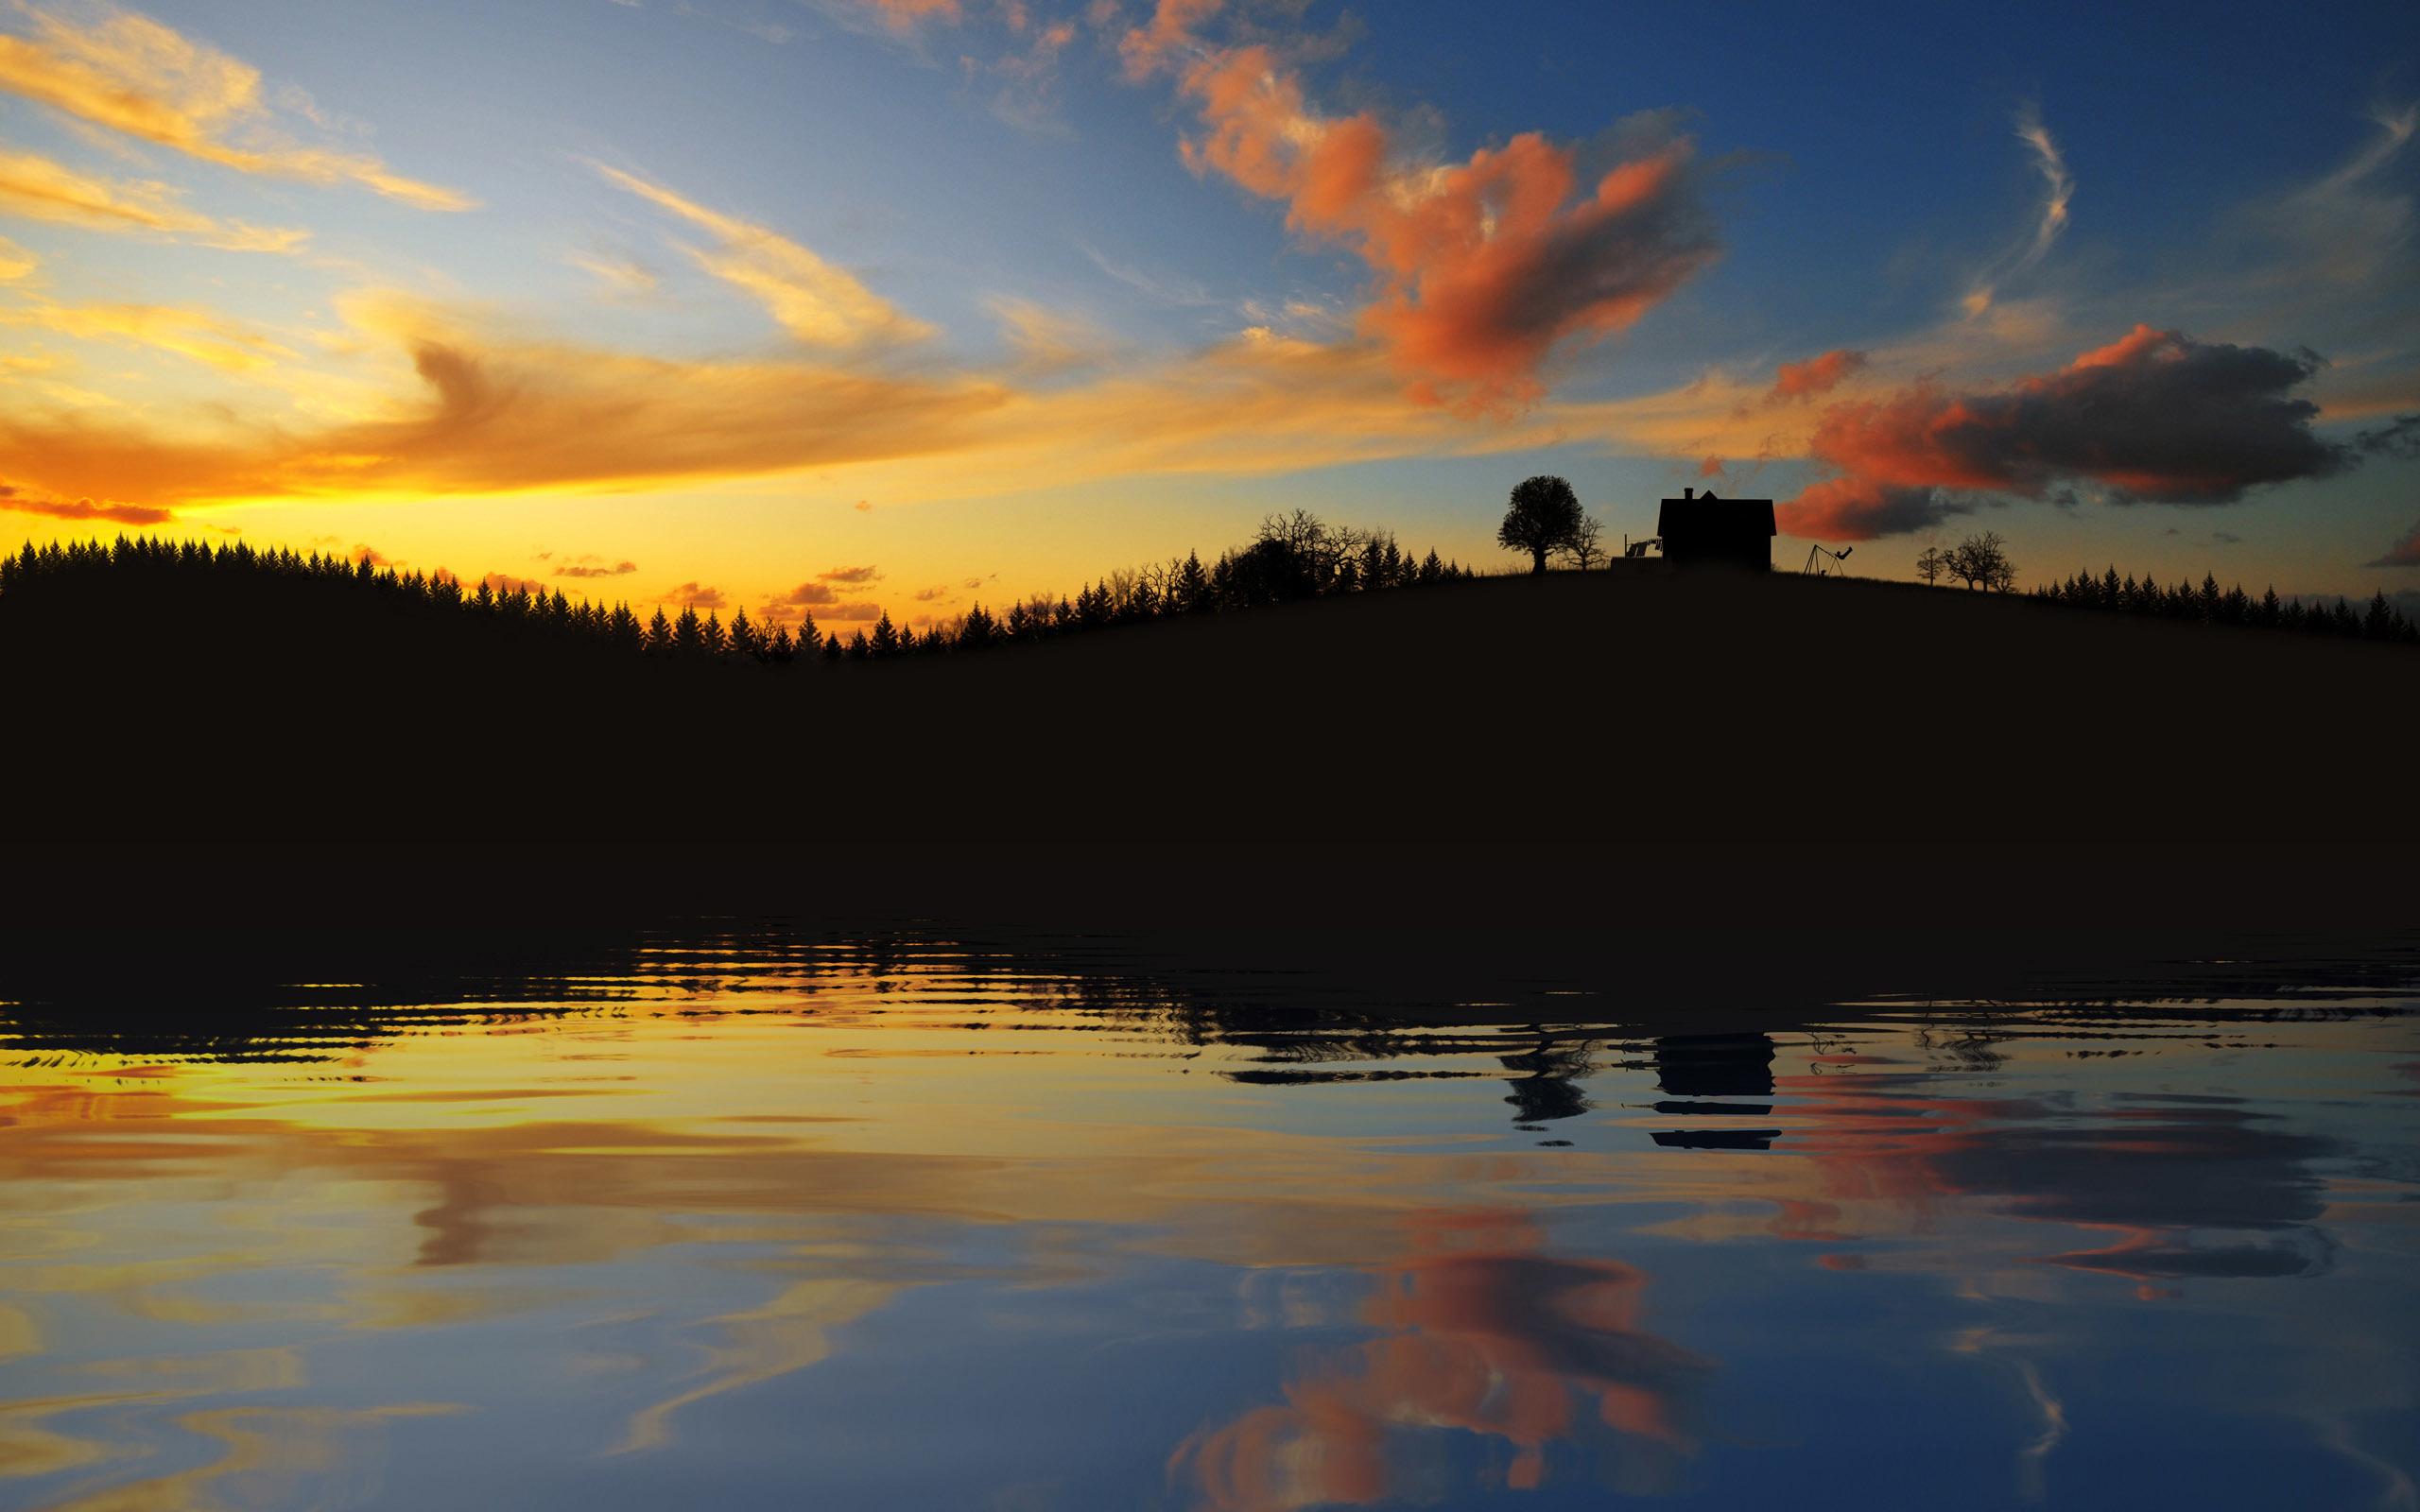 Картинка: Вечер, закат, пейзаж, дом, холм, вода, озеро, речка, деревья, облака, небо